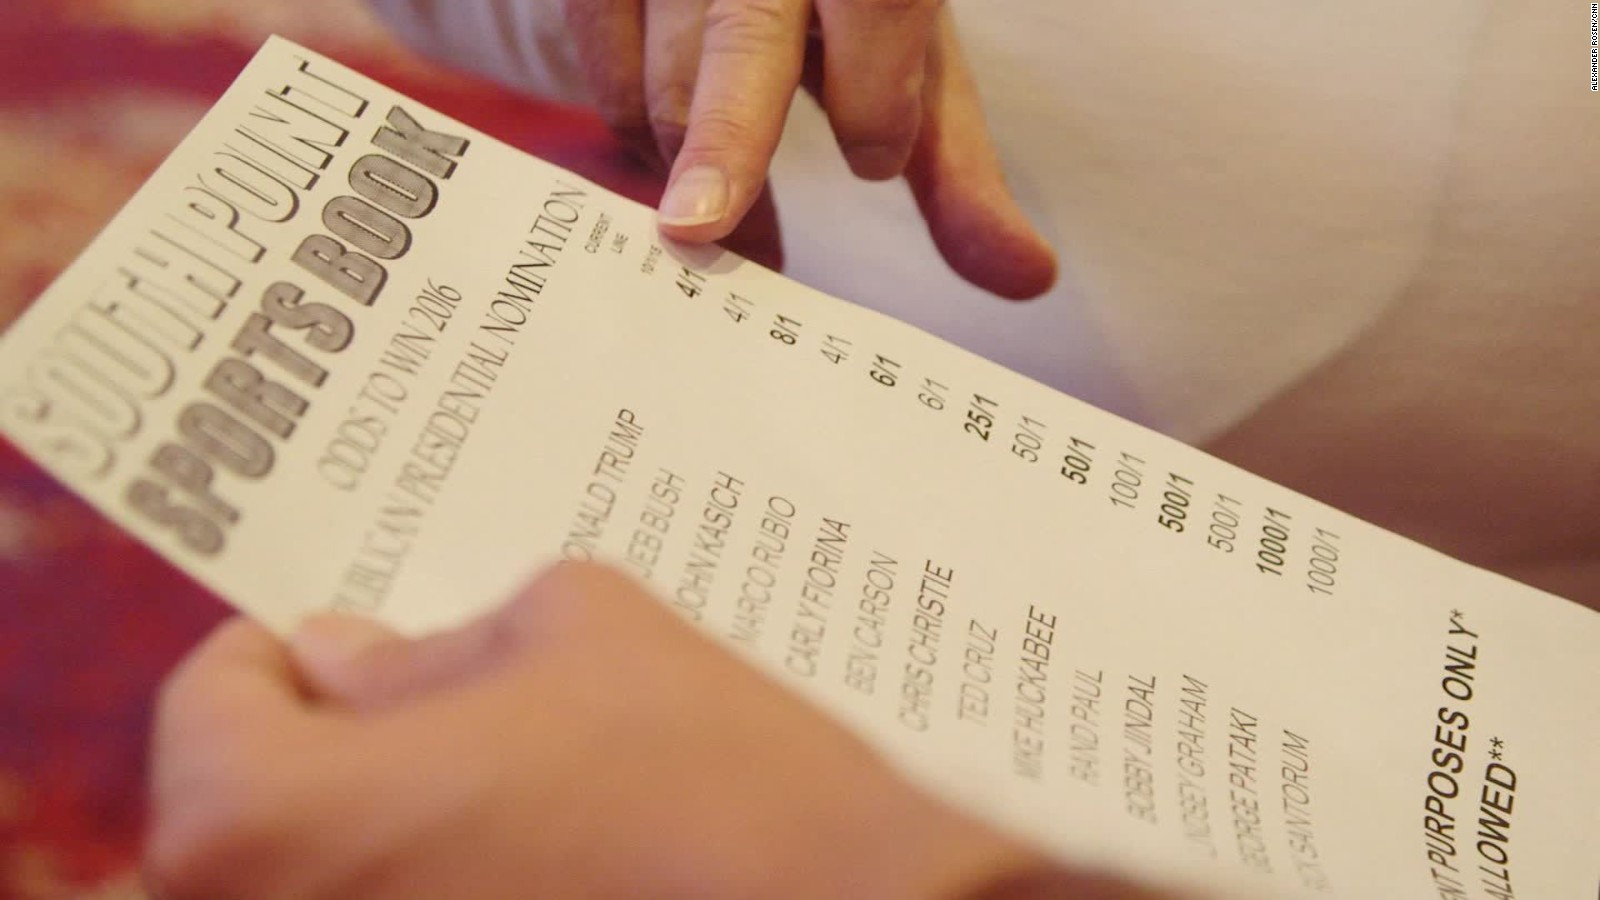 Election gambling illegal internet gambling and addiction